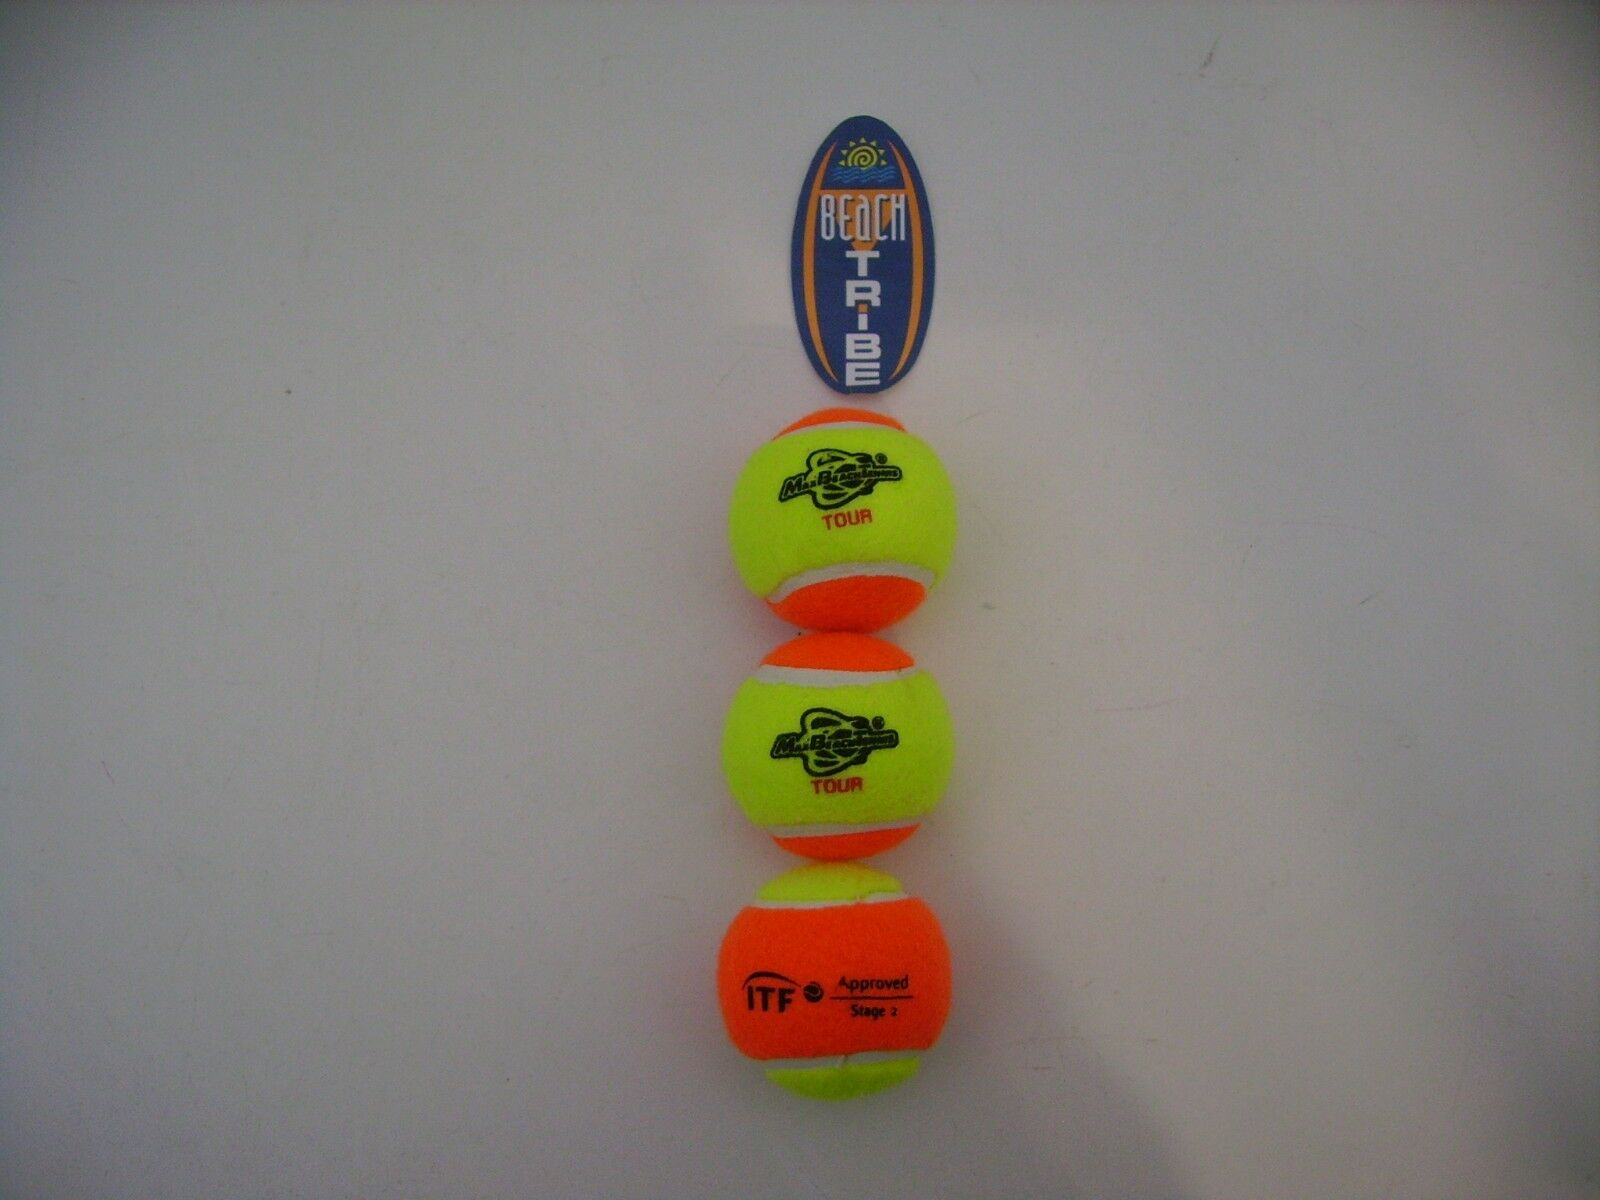 12 Balls Balls Beach Tennis MBT Tour Yellow orange ITF Approved Stage 2